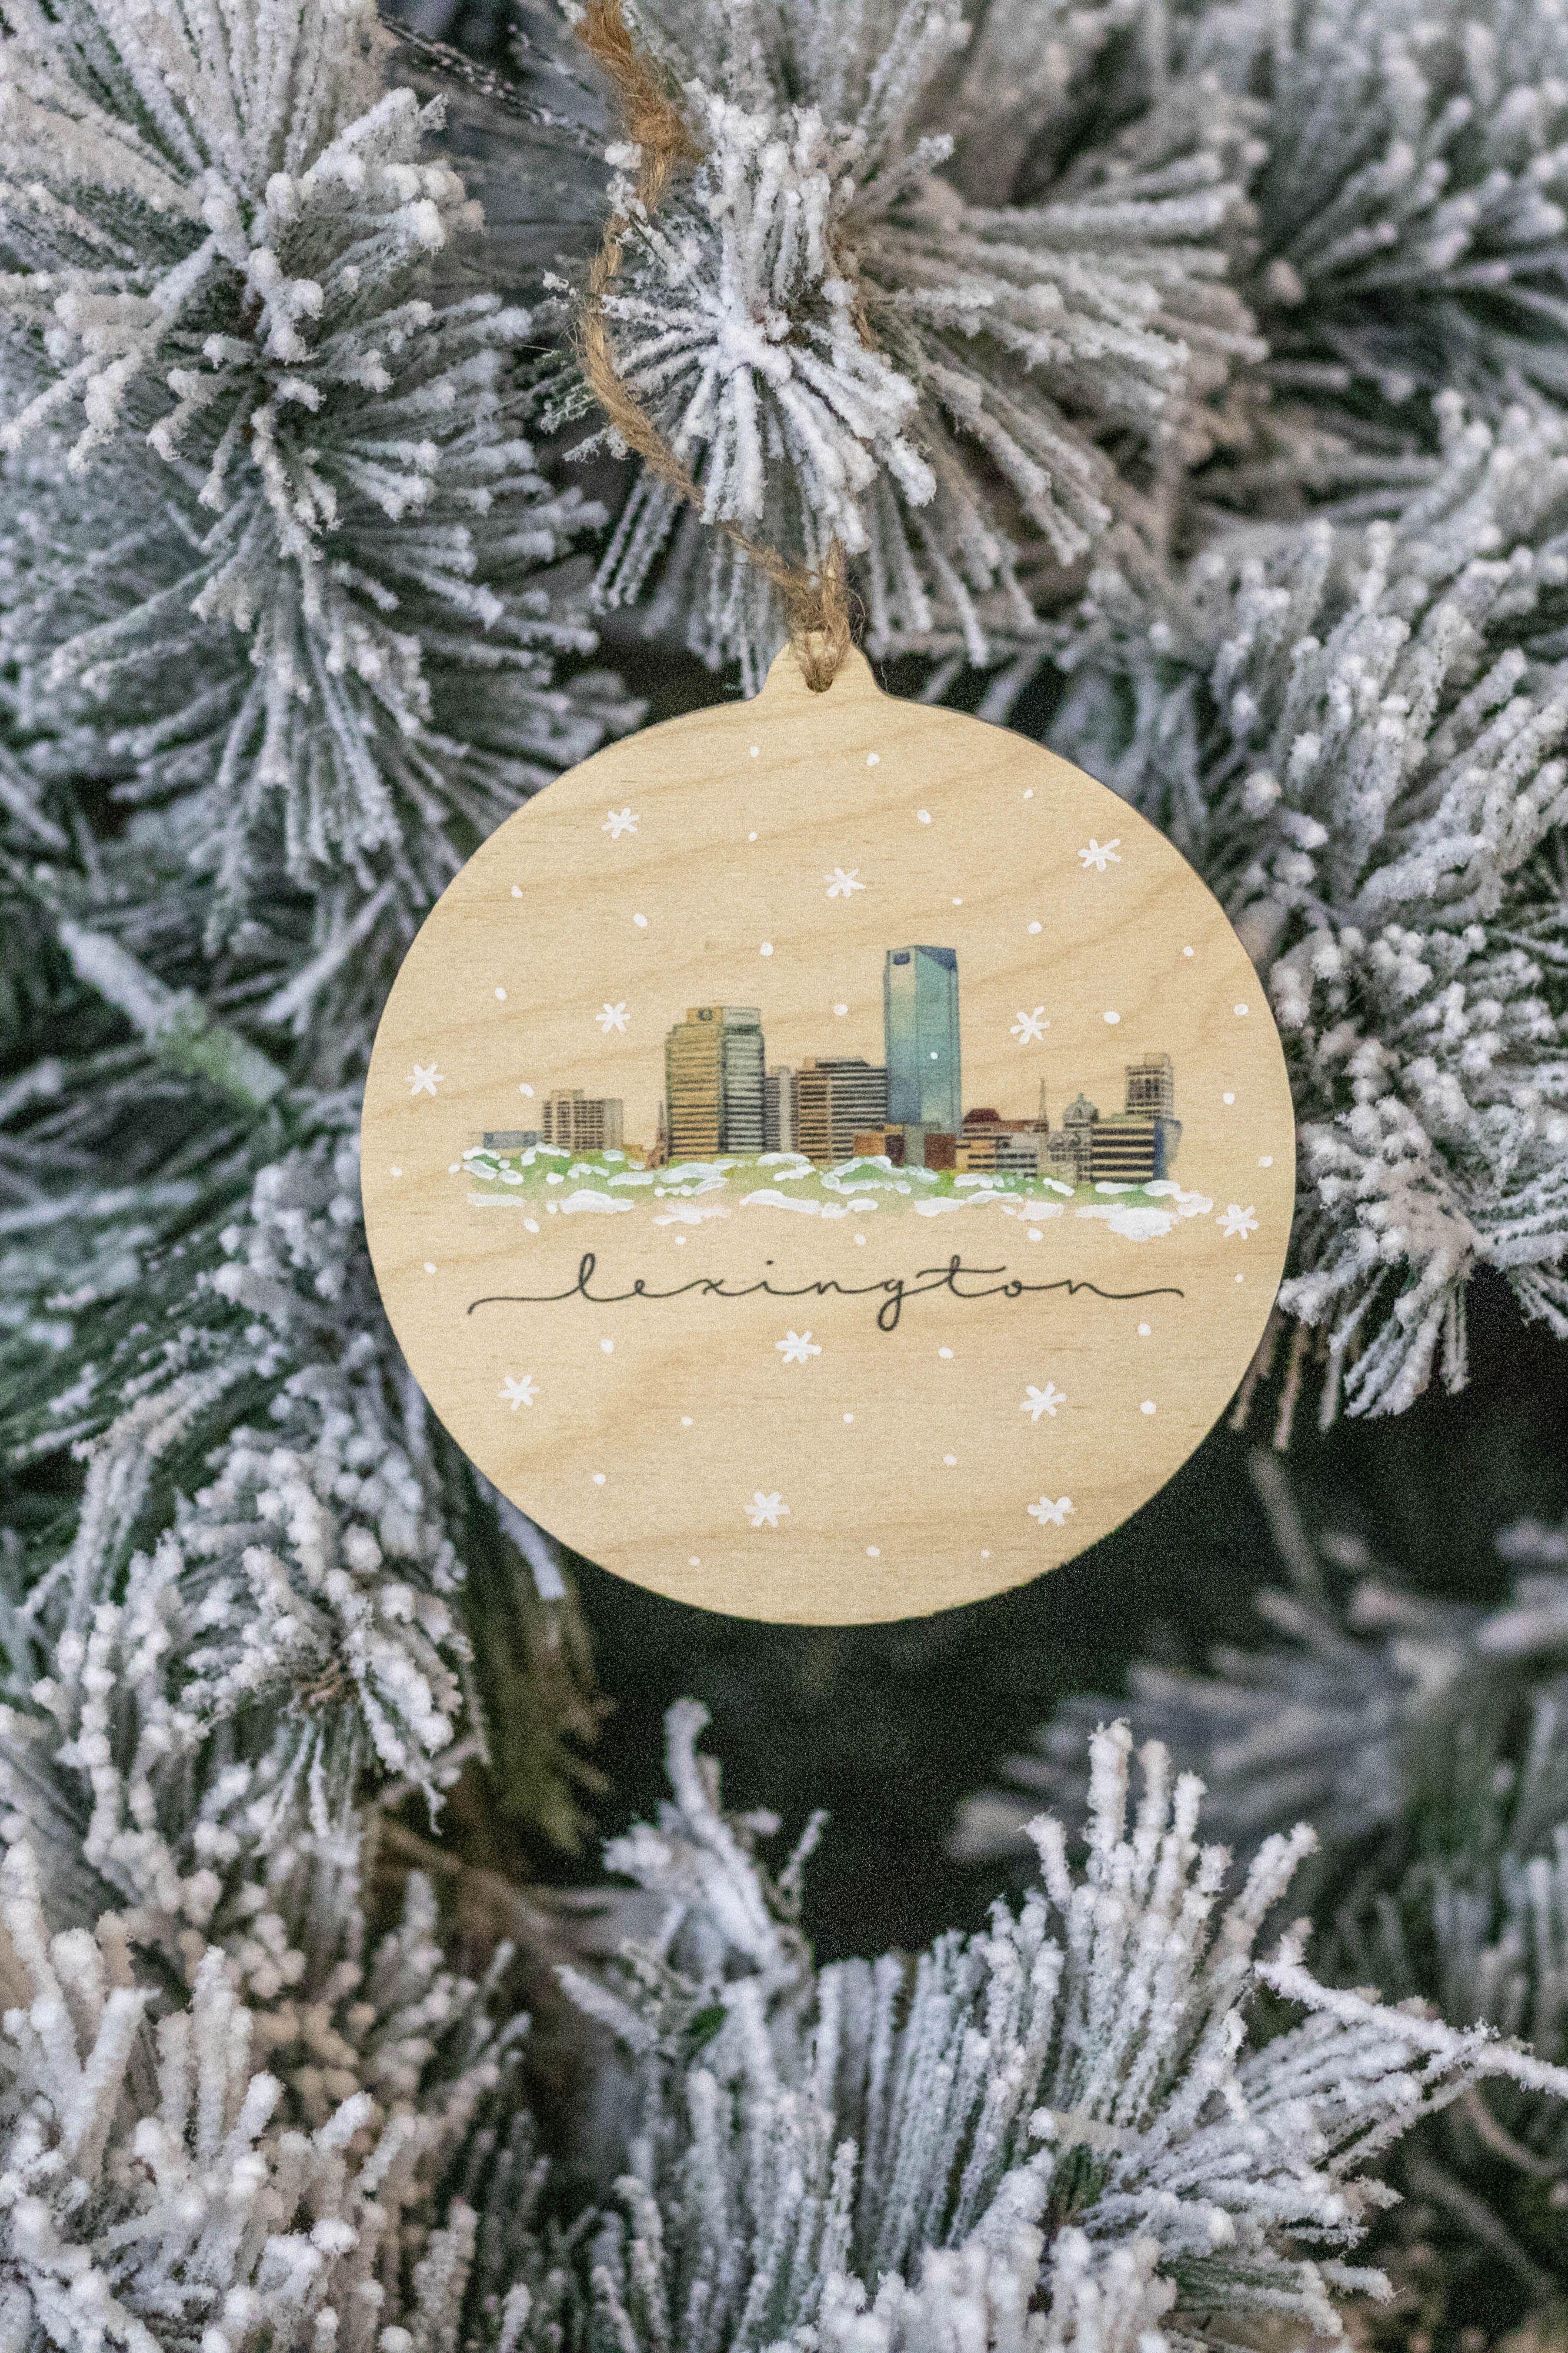 Stephaniehilenart Lexingtonky Sharethelex Kentuckychristmas Christmasdecor Christmasornament Wood Christmas Tree Ornaments Ornaments Christmas Ornaments